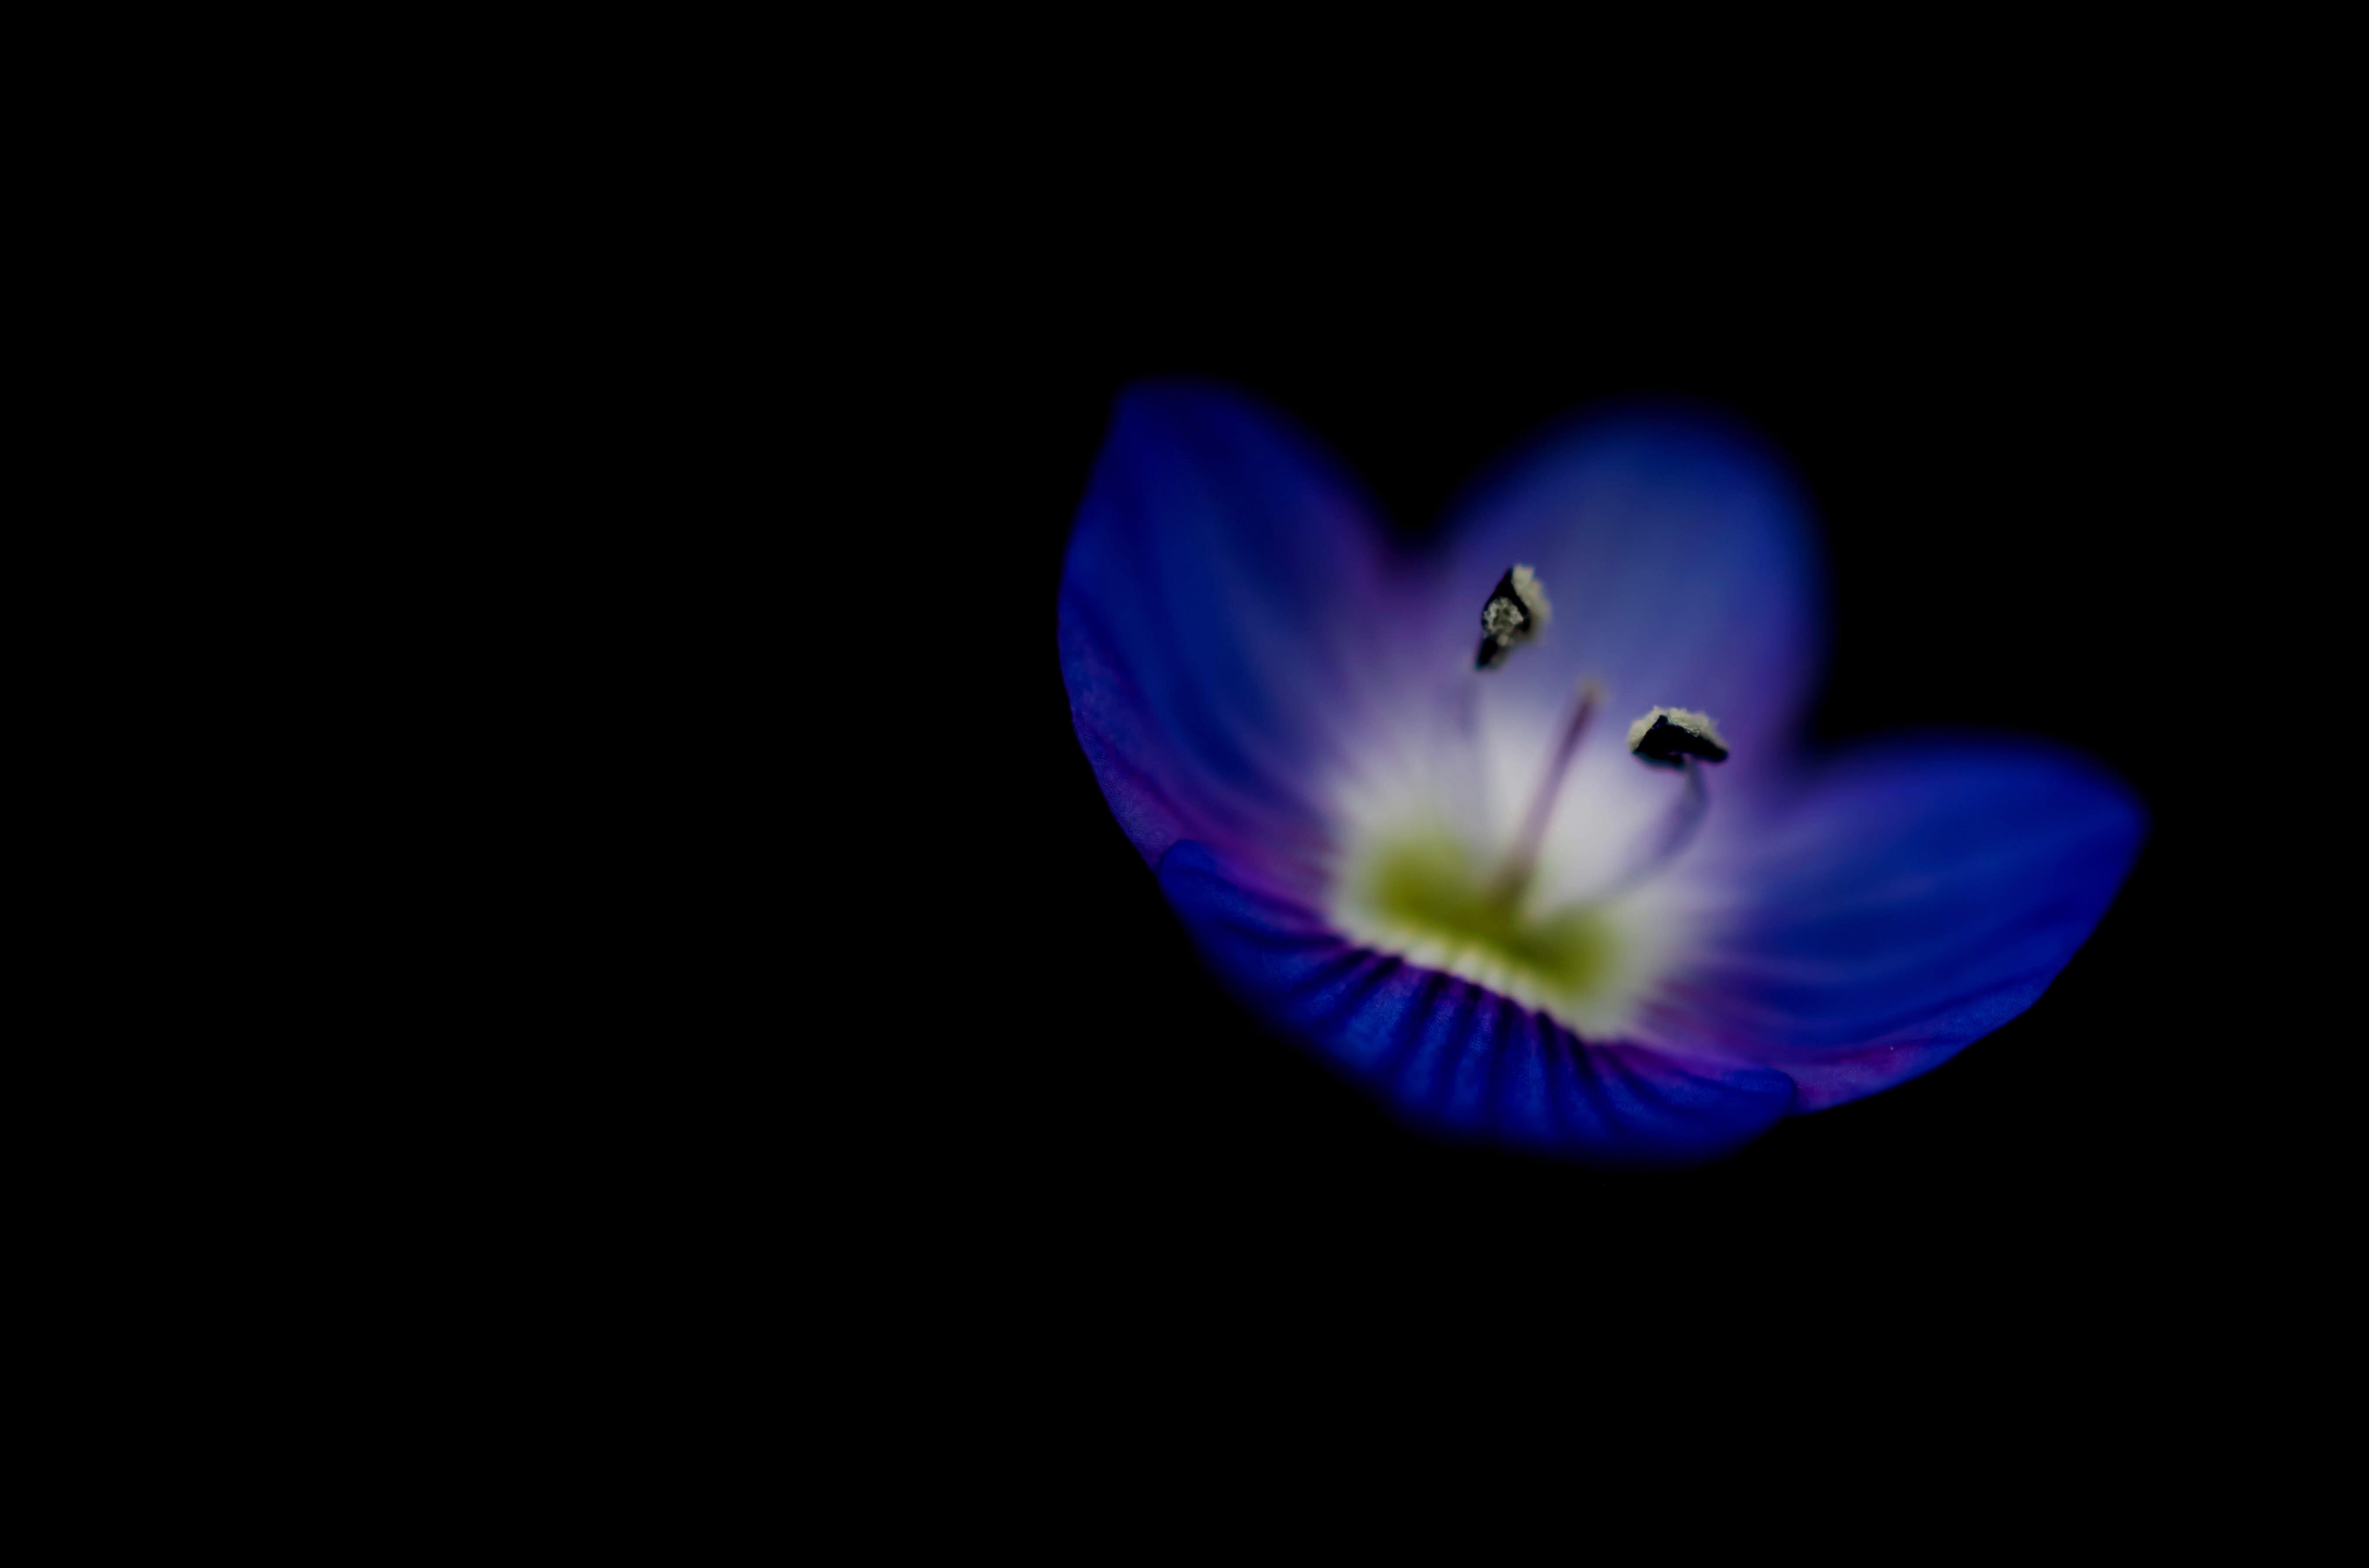 Wallpaper Flower Macro Blackbackground Purple Rip